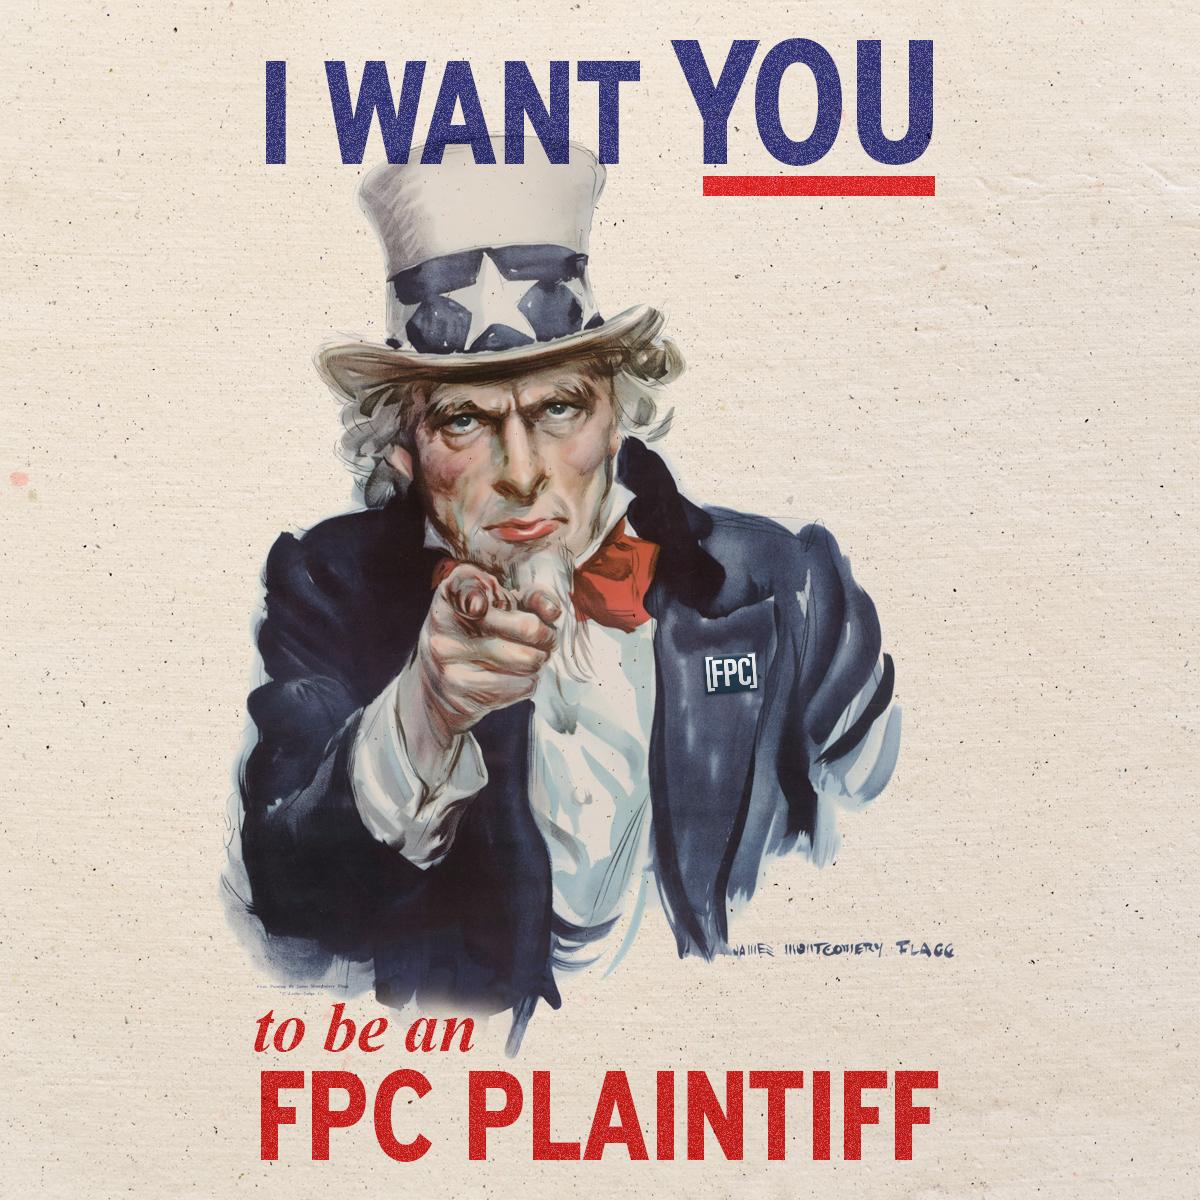 FPC Uncle Sam